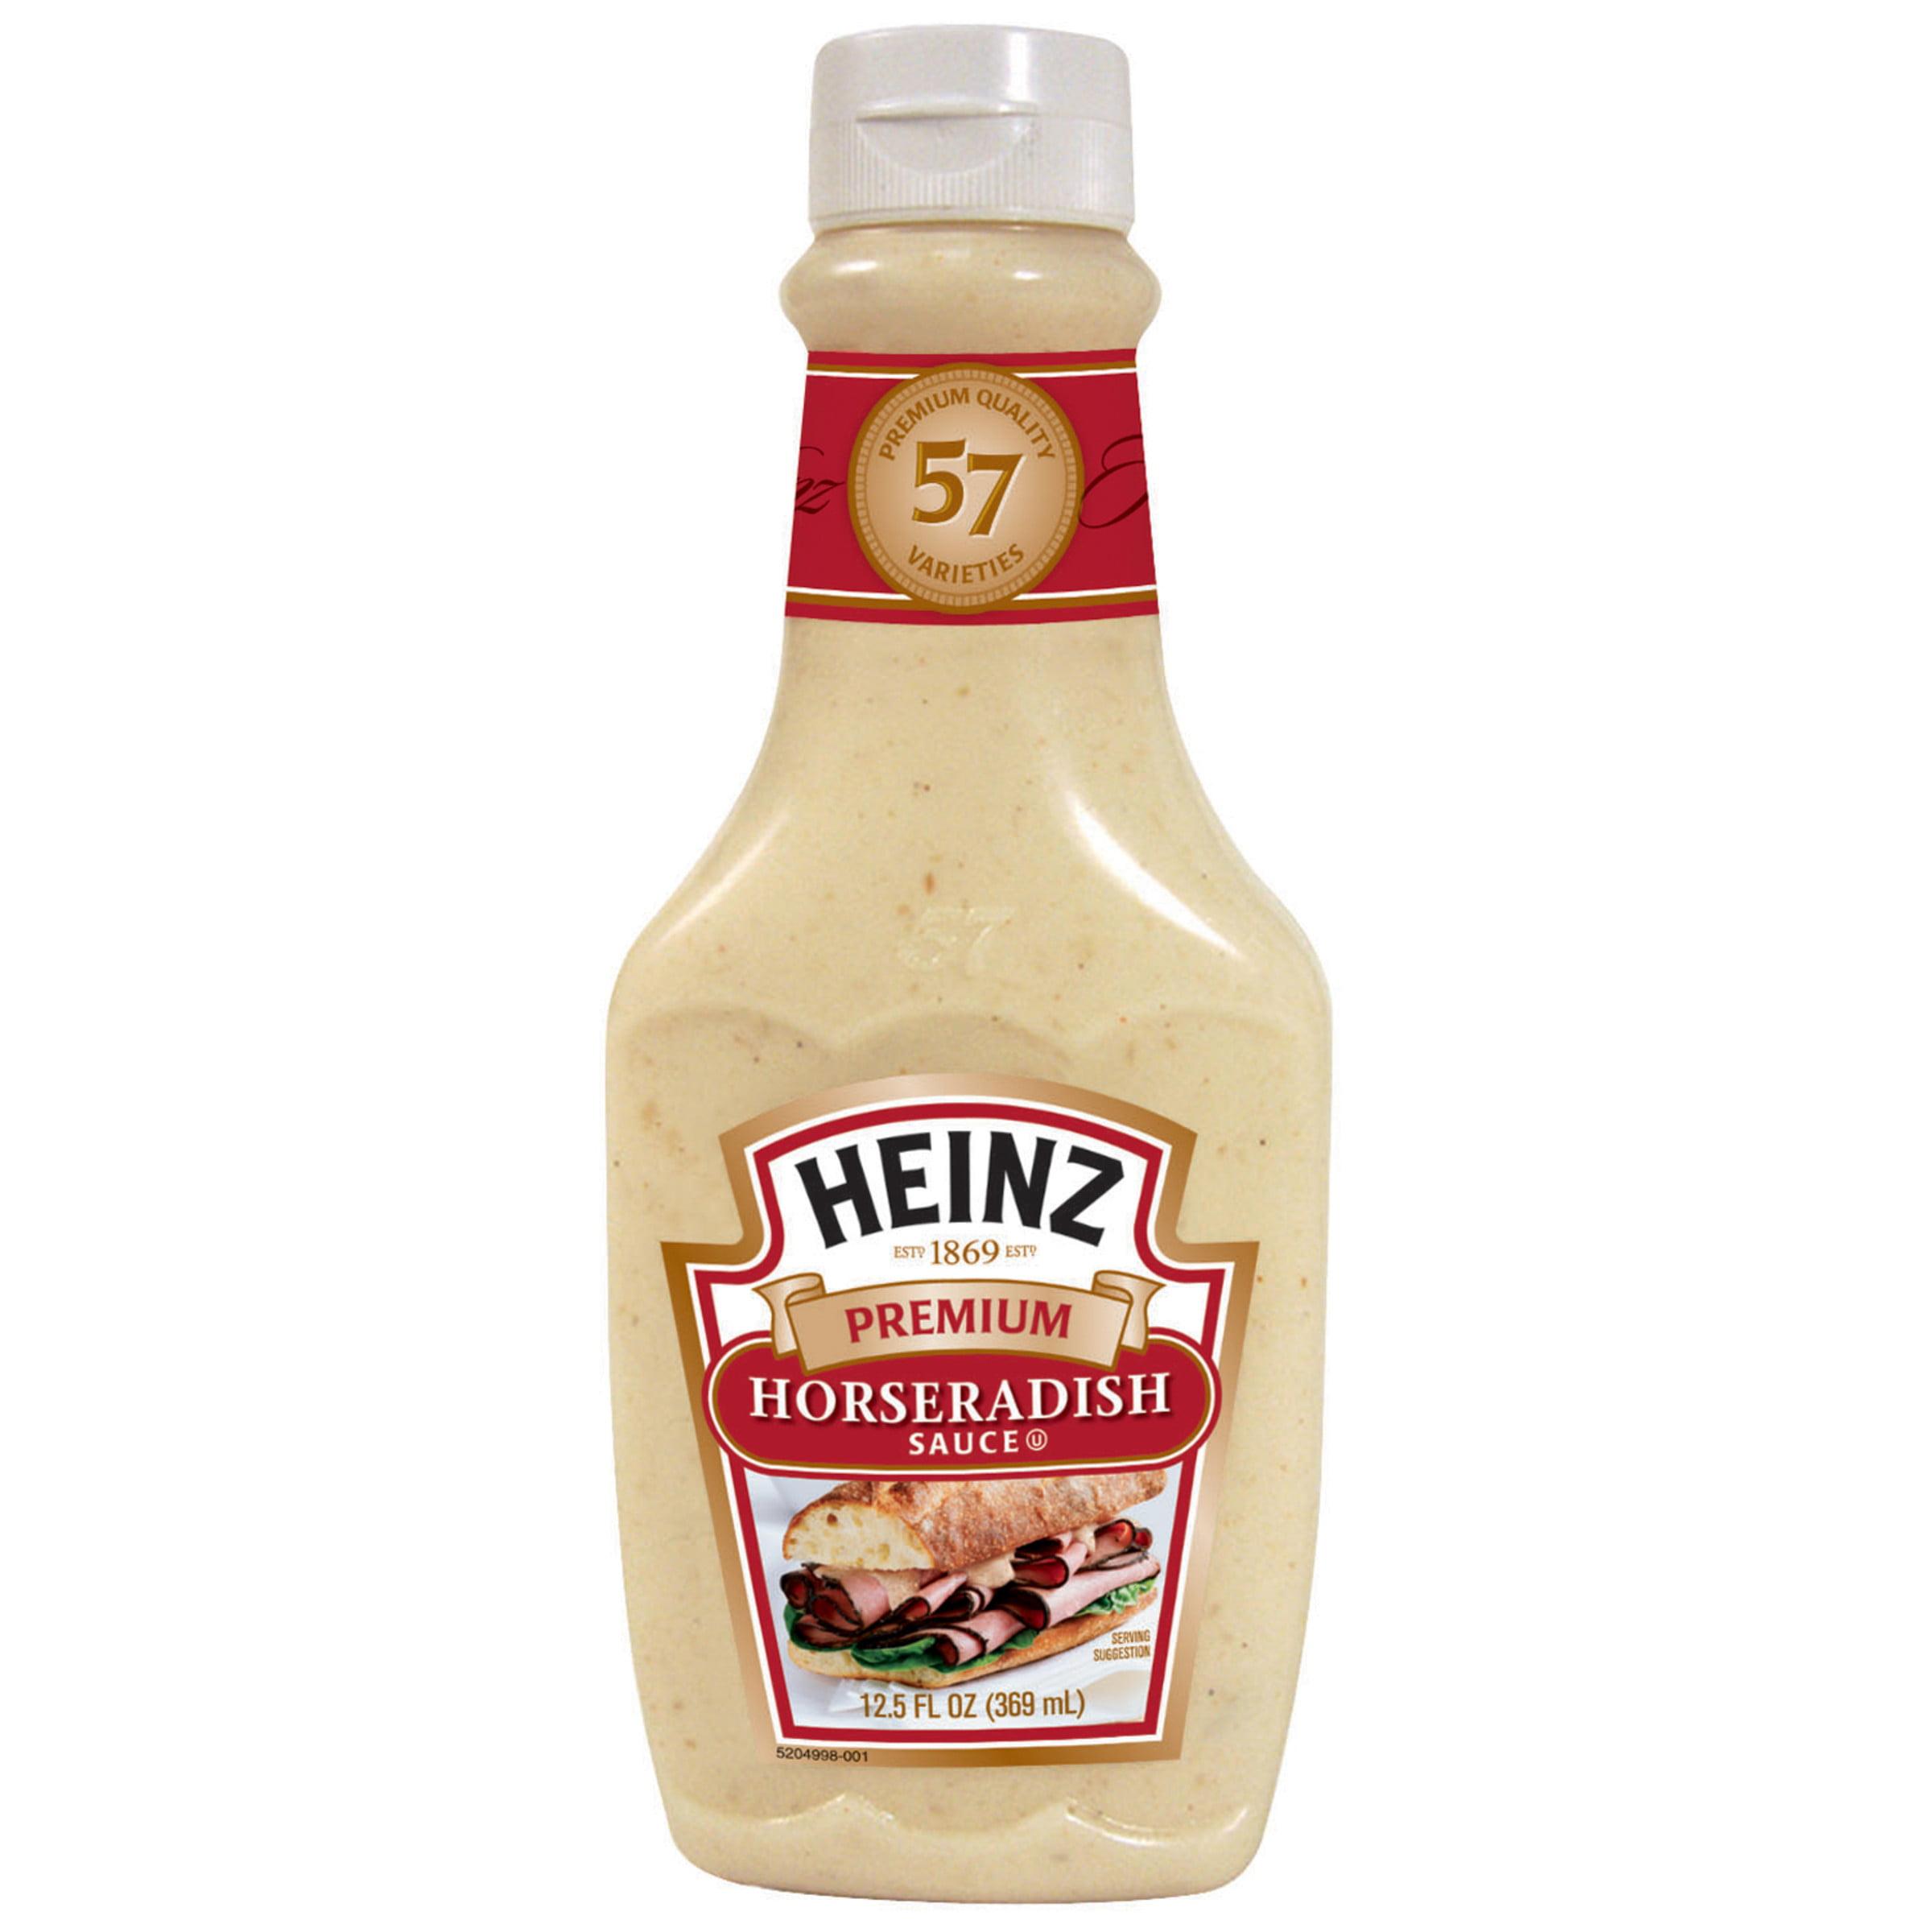 Heinz Premium Horseradish Sauce 12 5 Oz Bottle Walmart Com Walmart Com